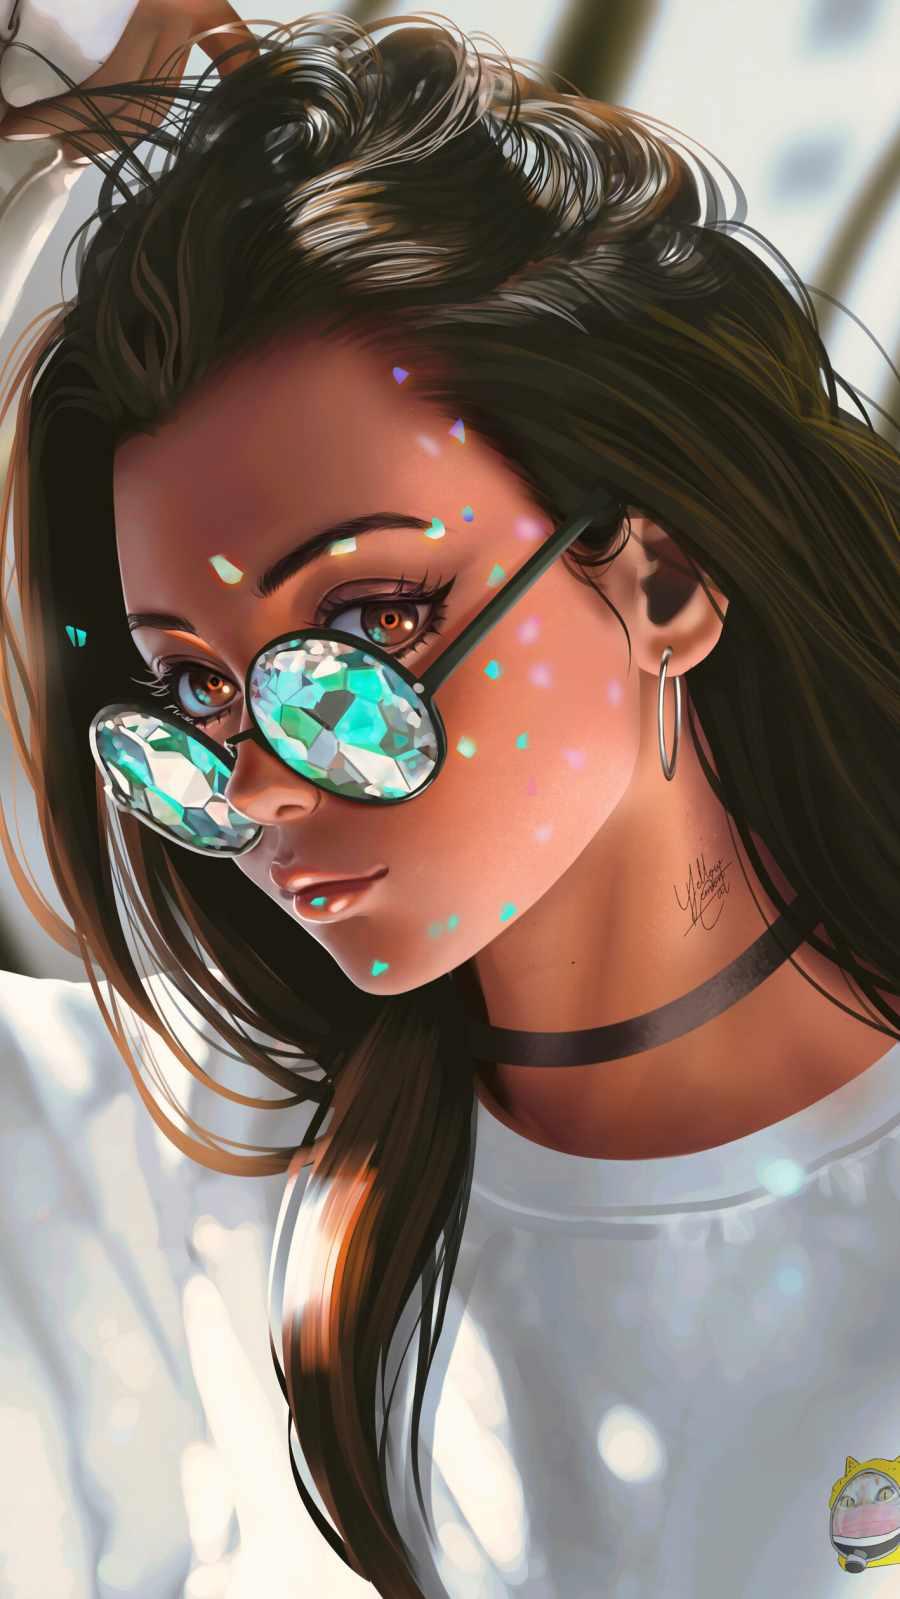 Fashion Girl Sunglasses iPhone Wallpaper